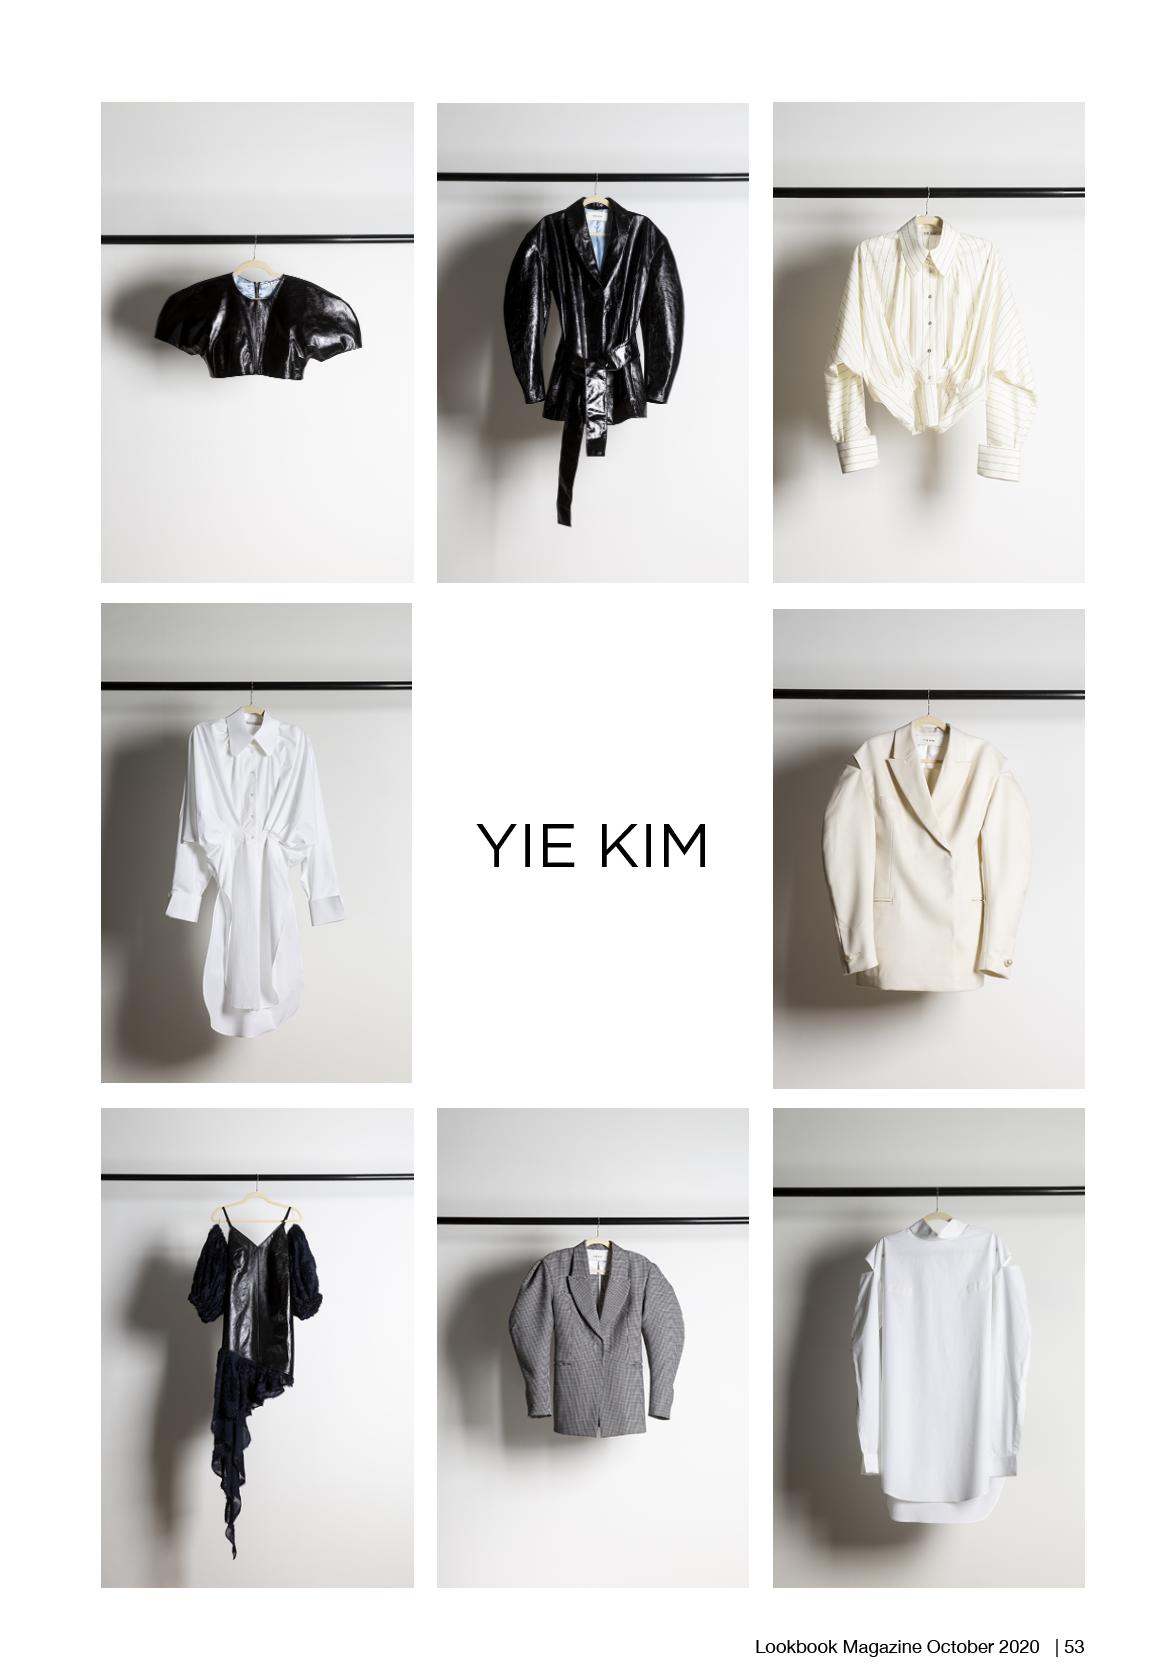 YIE KIM